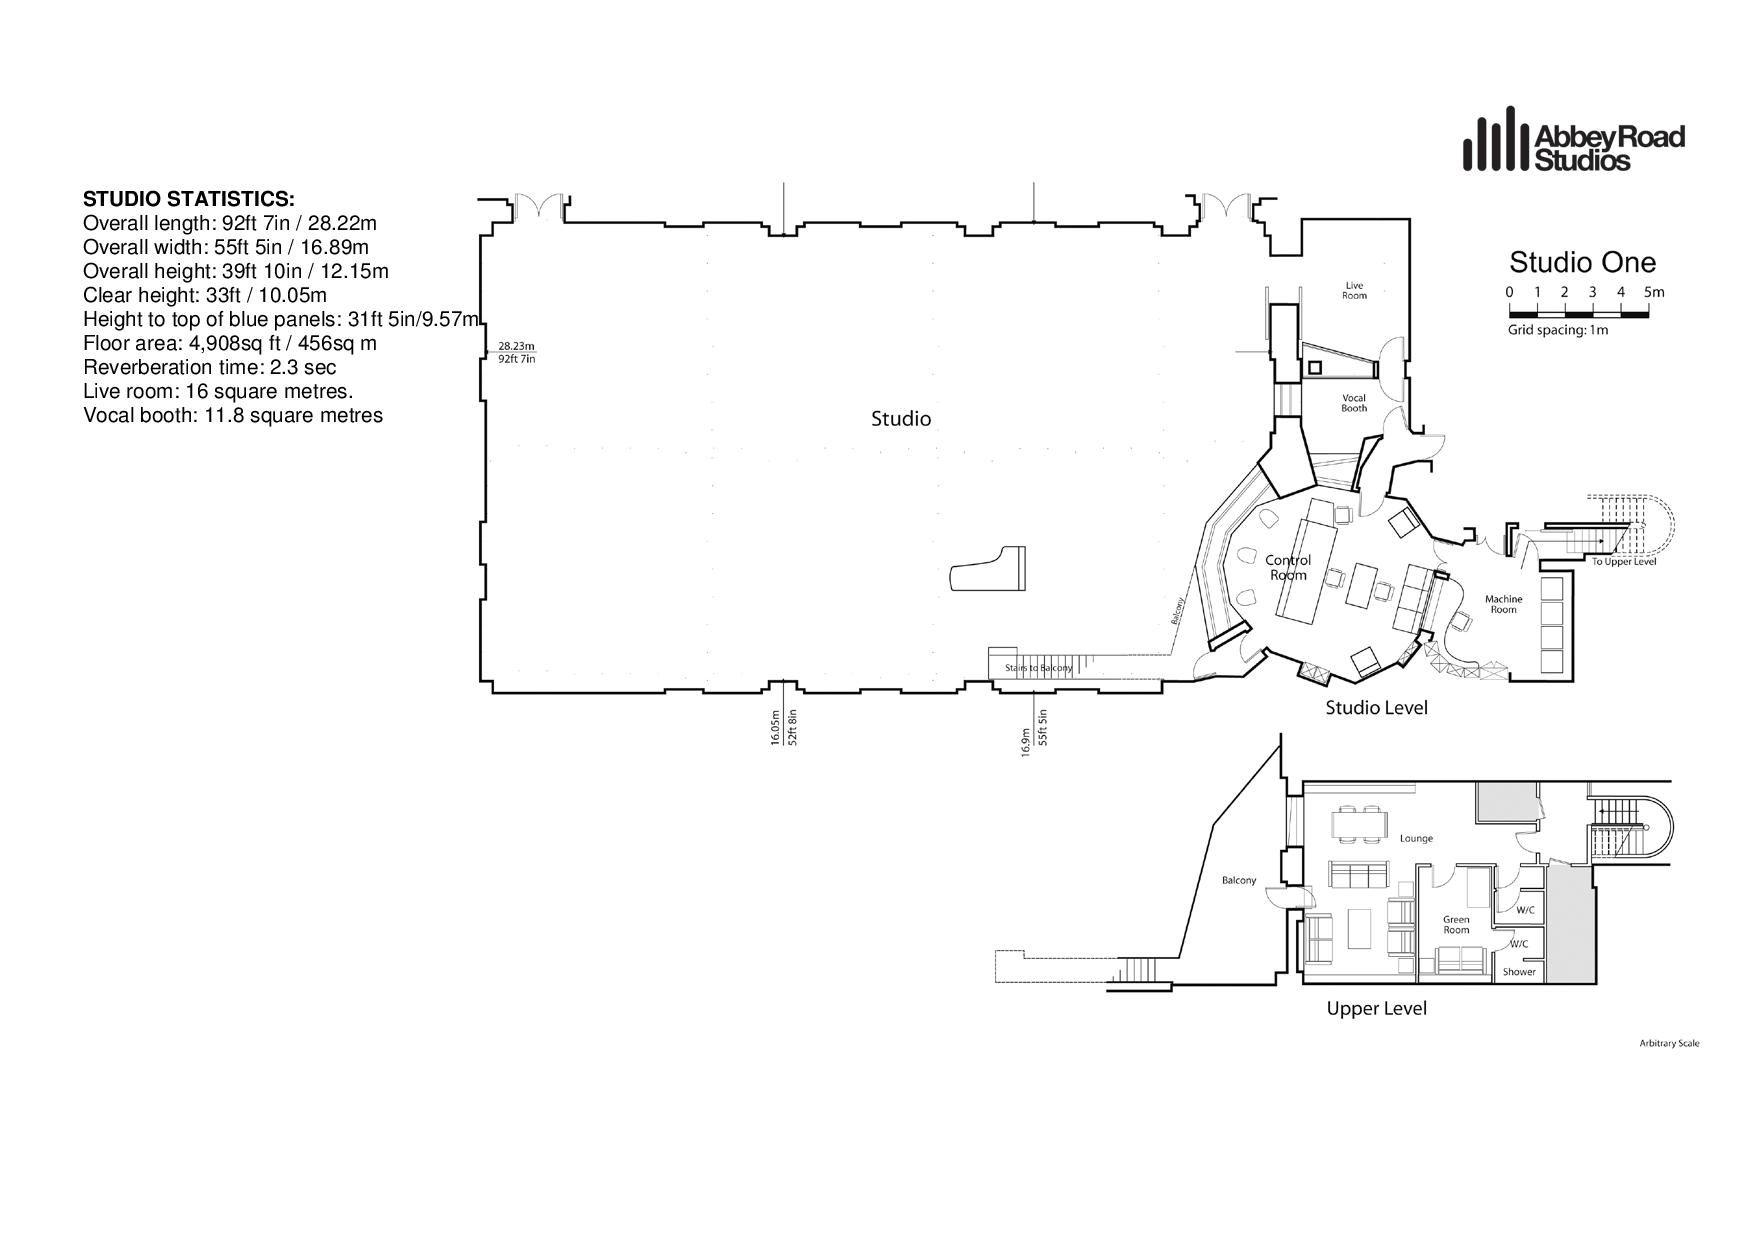 abbey road studio plans buscar con google openbuildingeando abbey road studio plans buscar con google